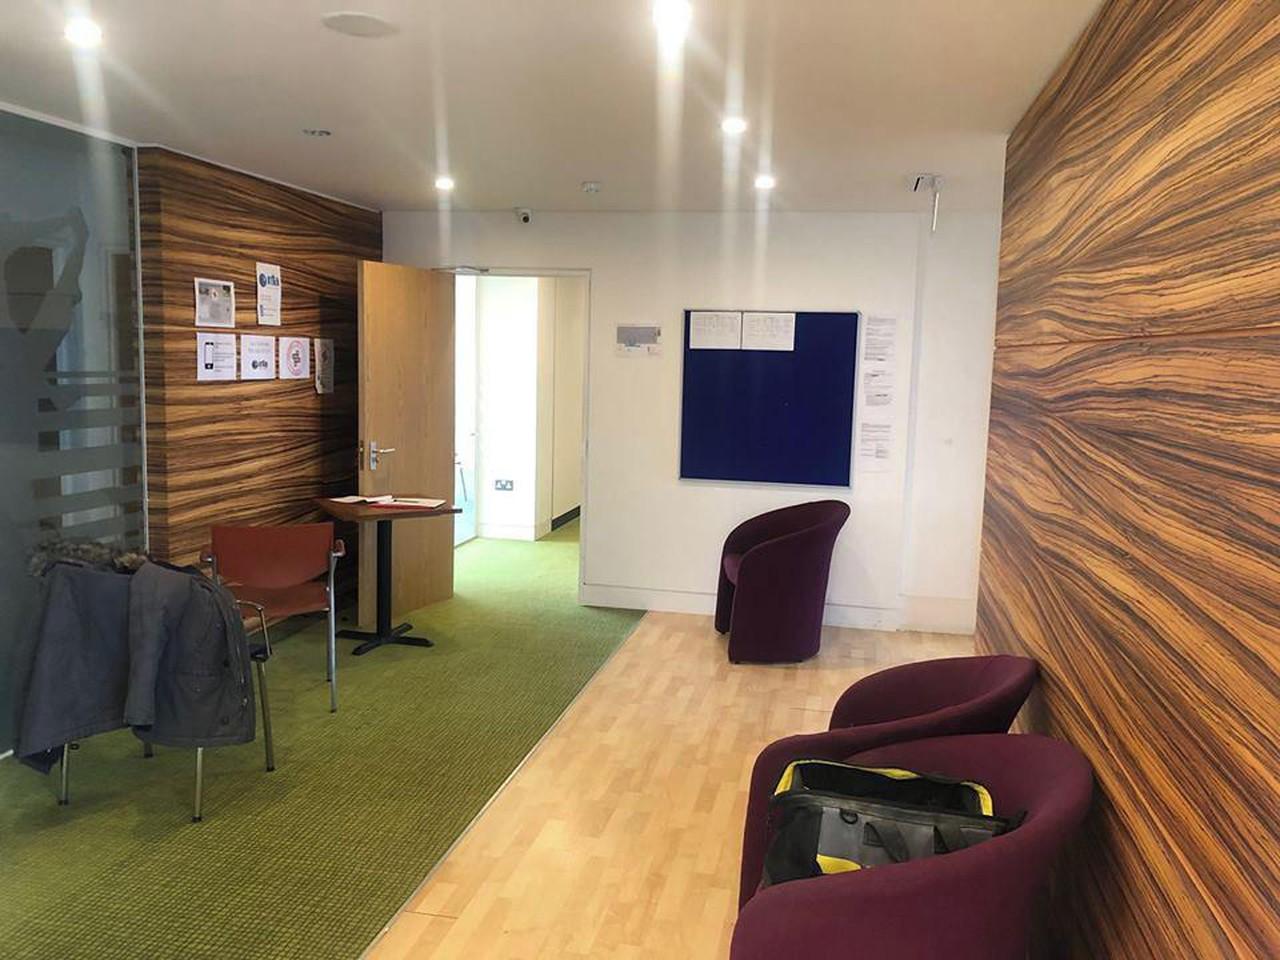 Londen training rooms Vergaderruimte meeting space image 0